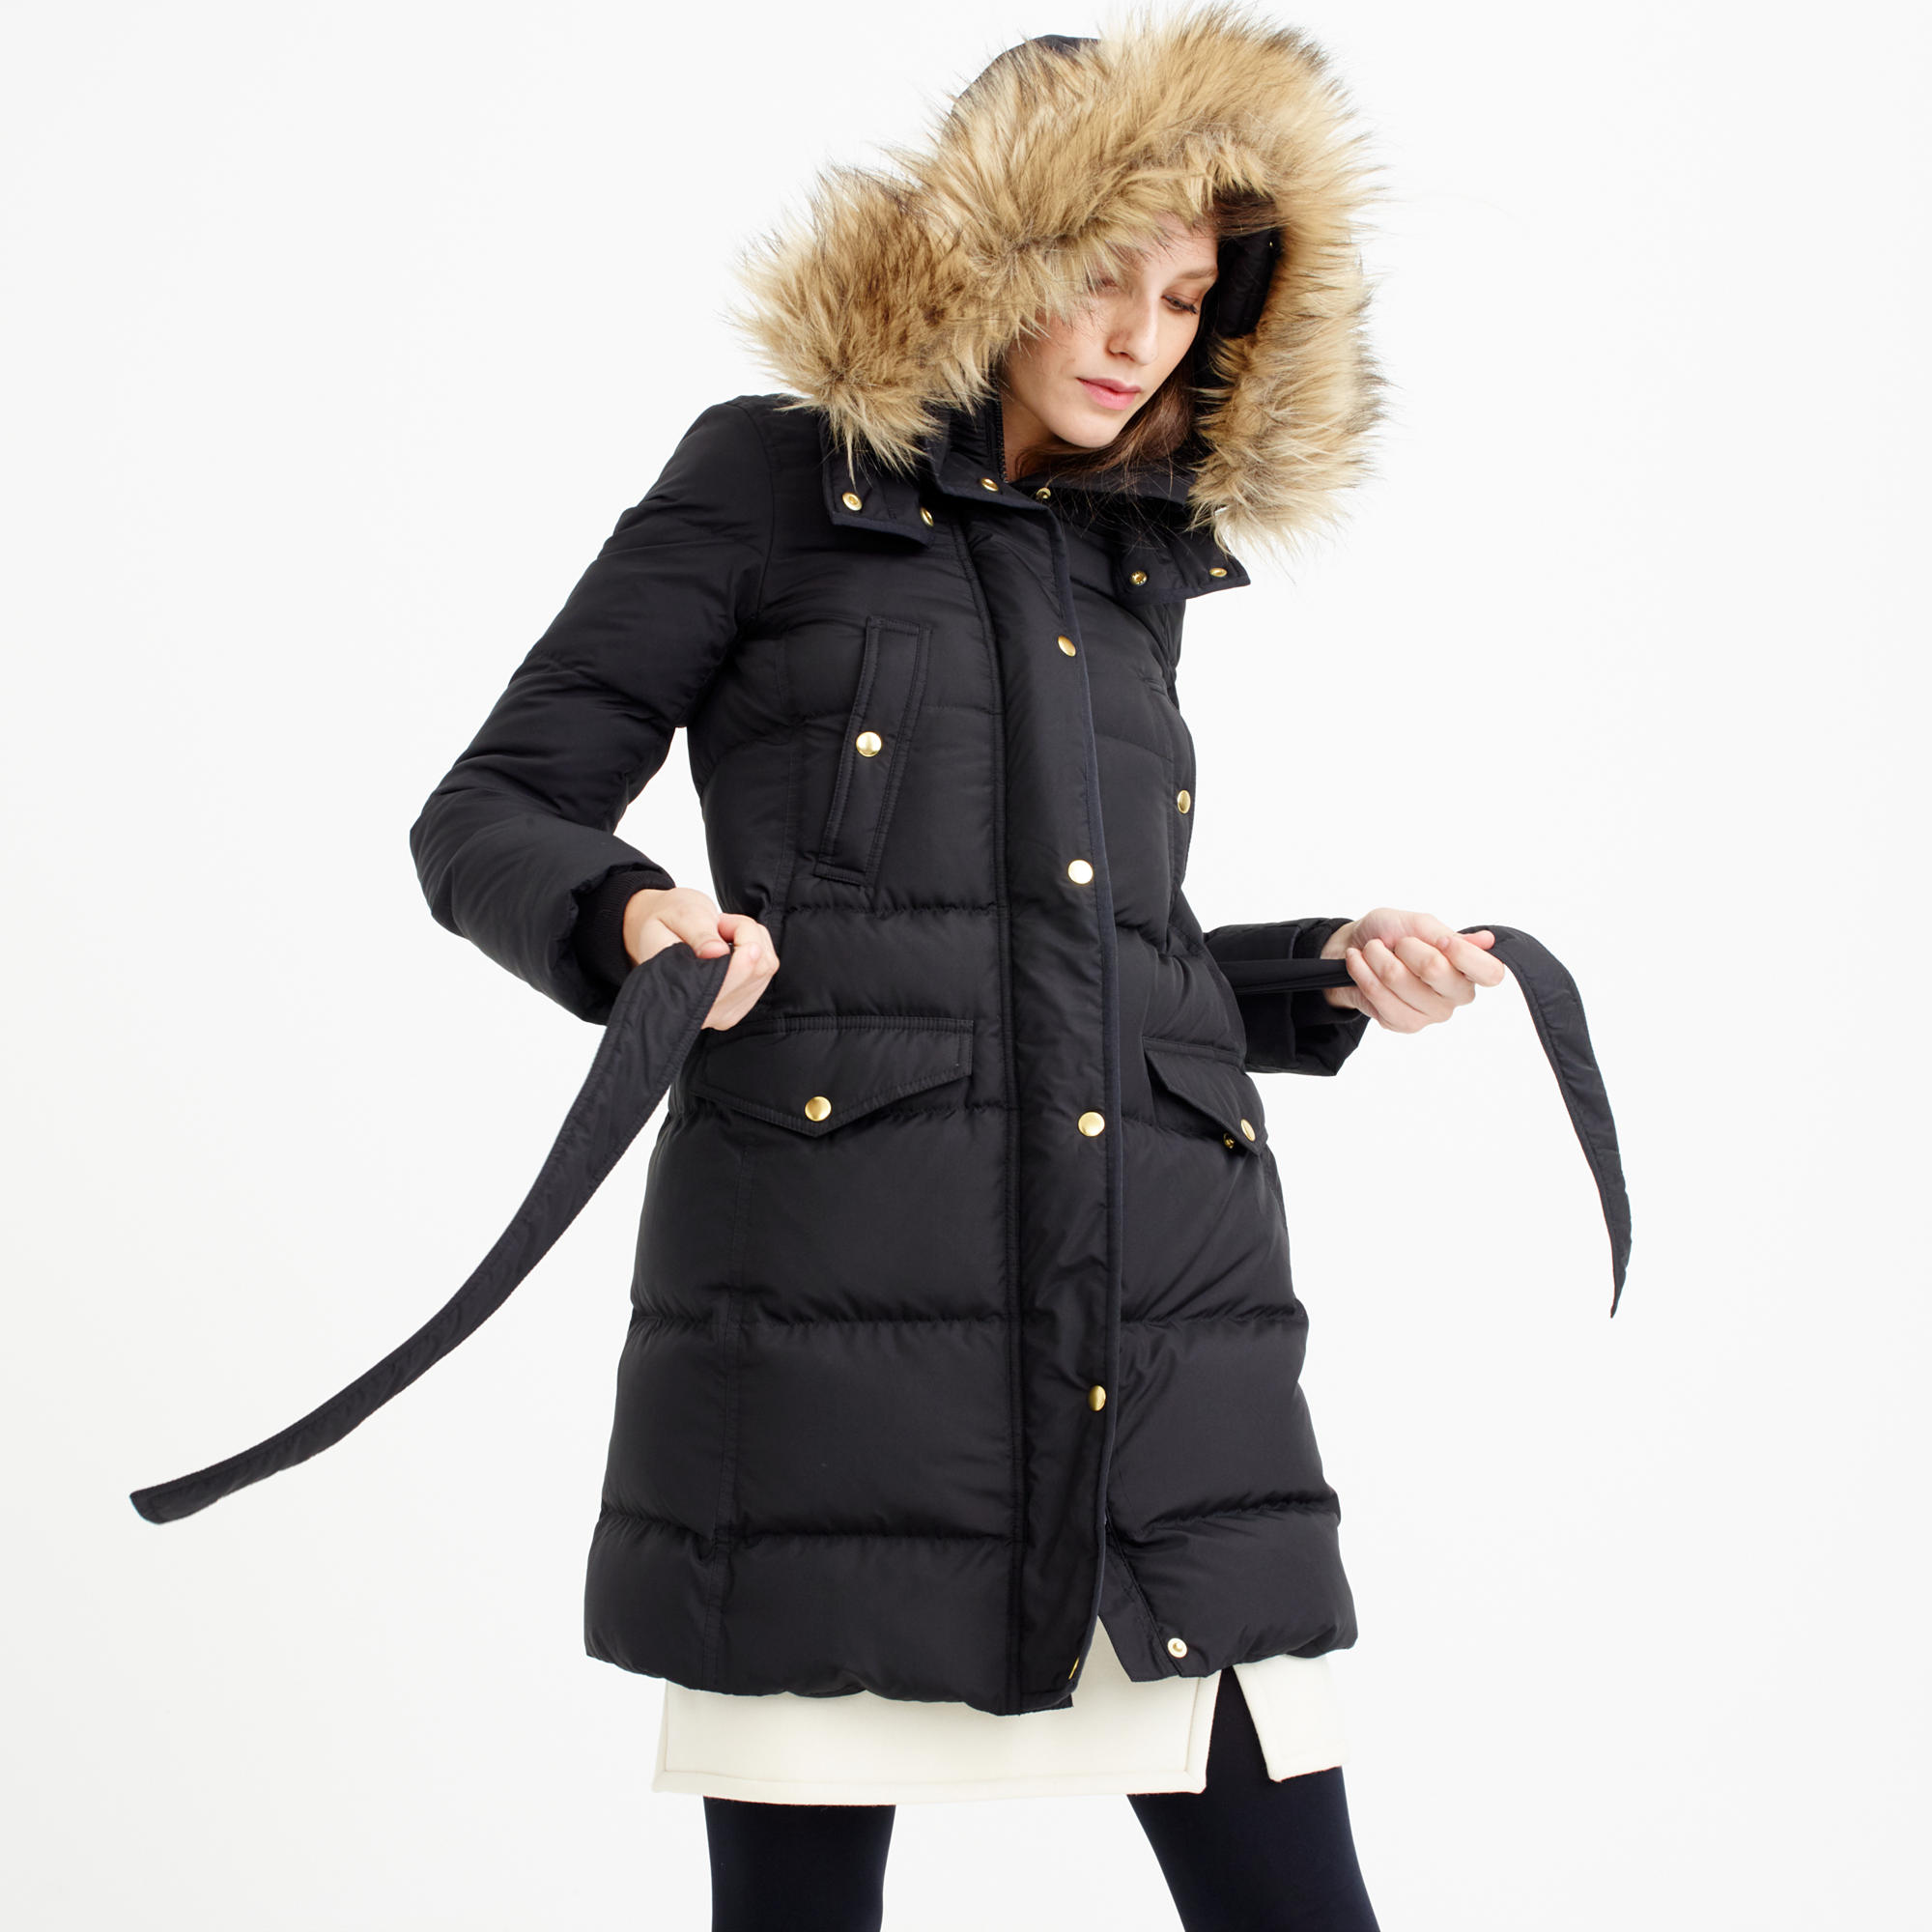 Wintress puffer coat with faux-fur hood : | J.Crew